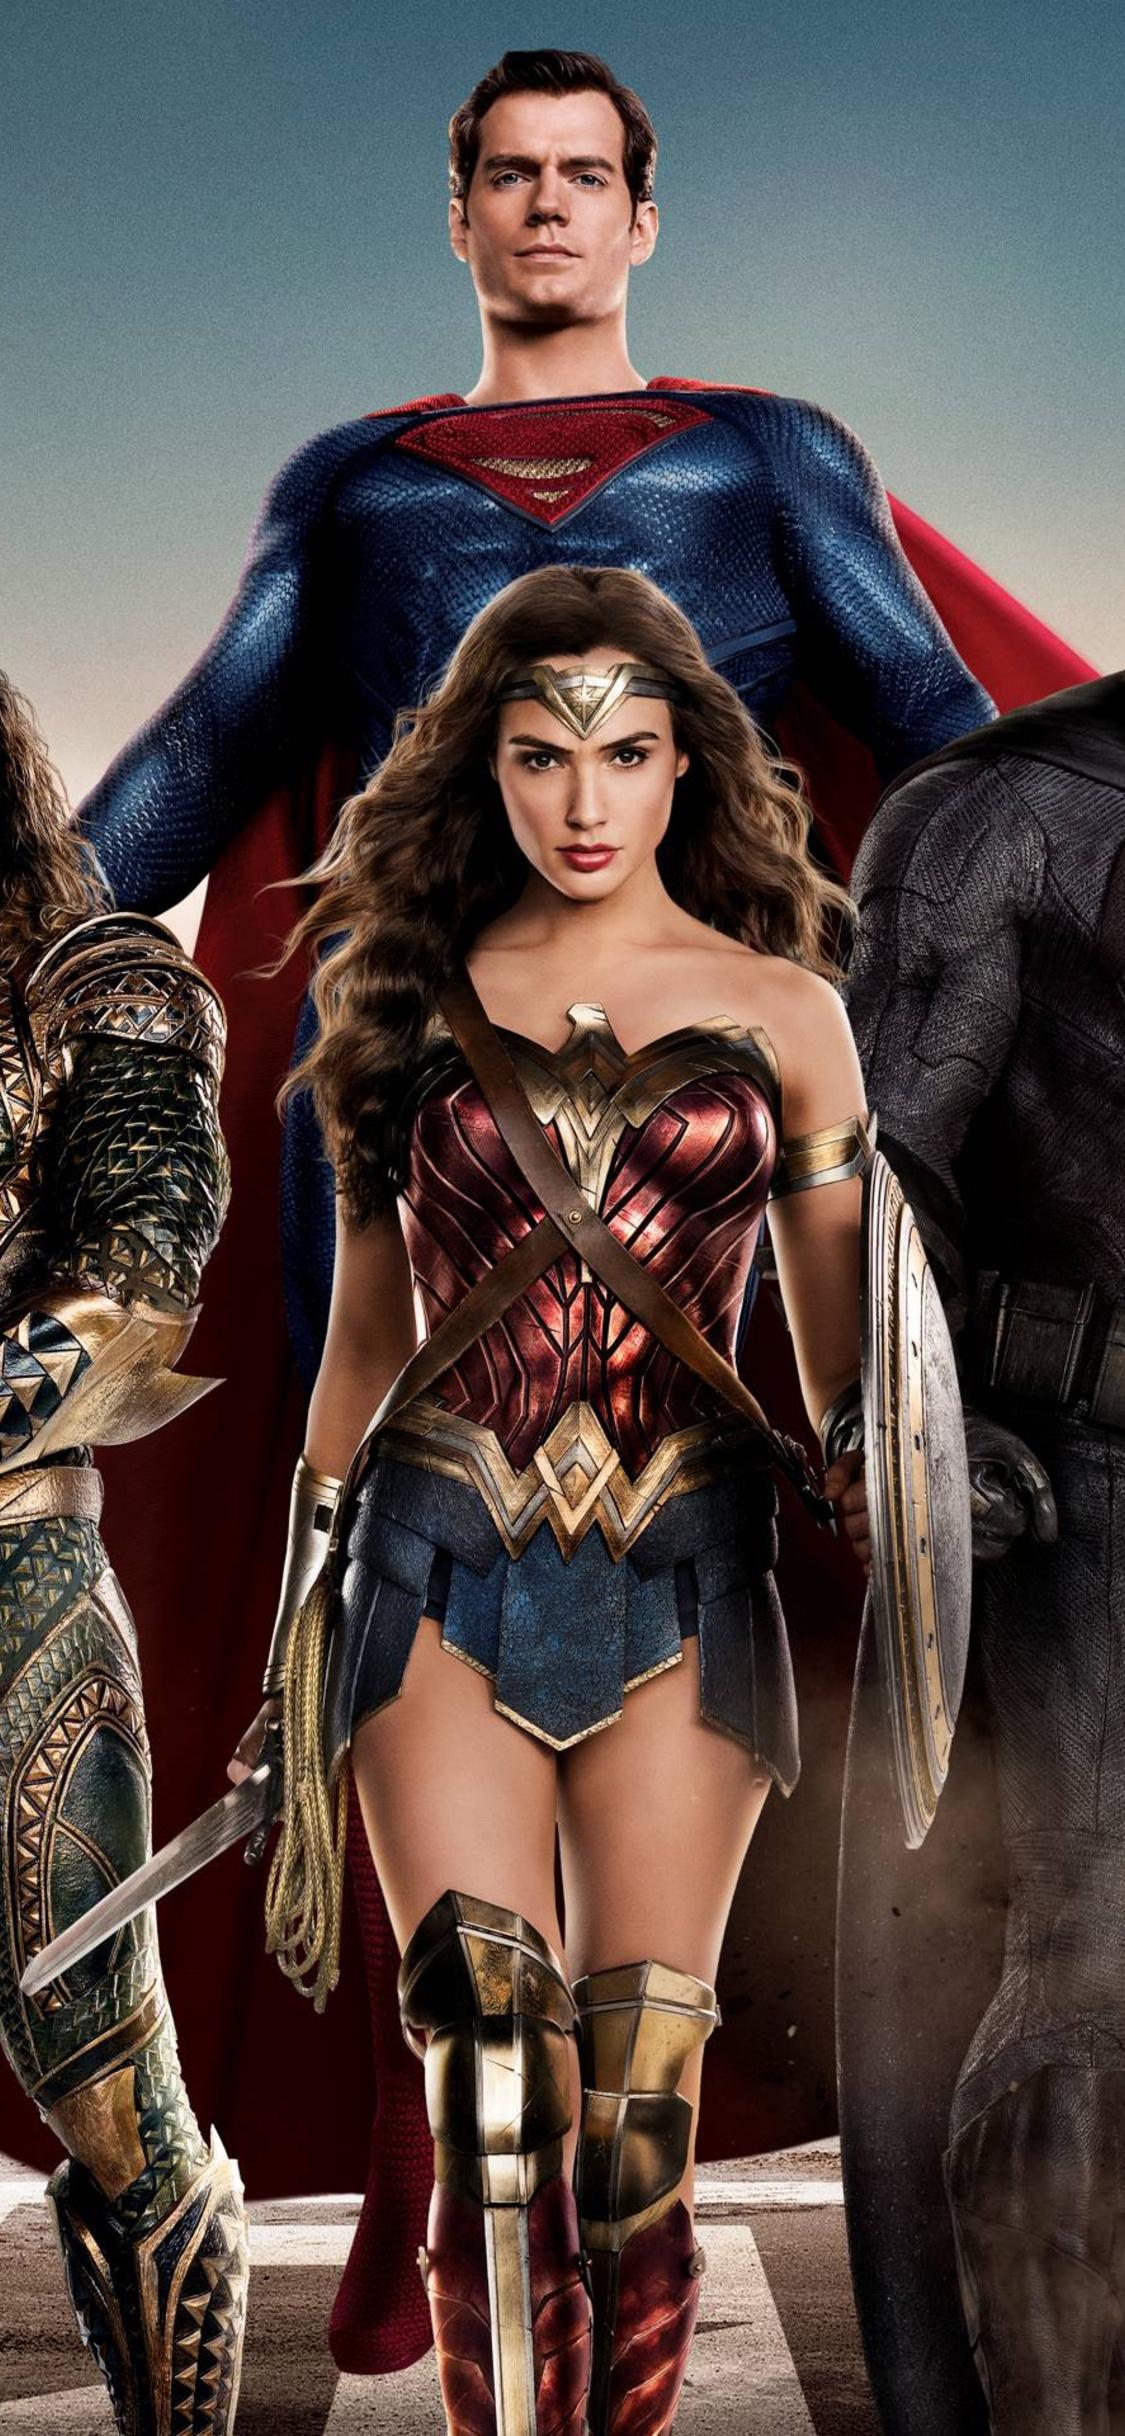 Justice League 2017 Movie Poster Ev